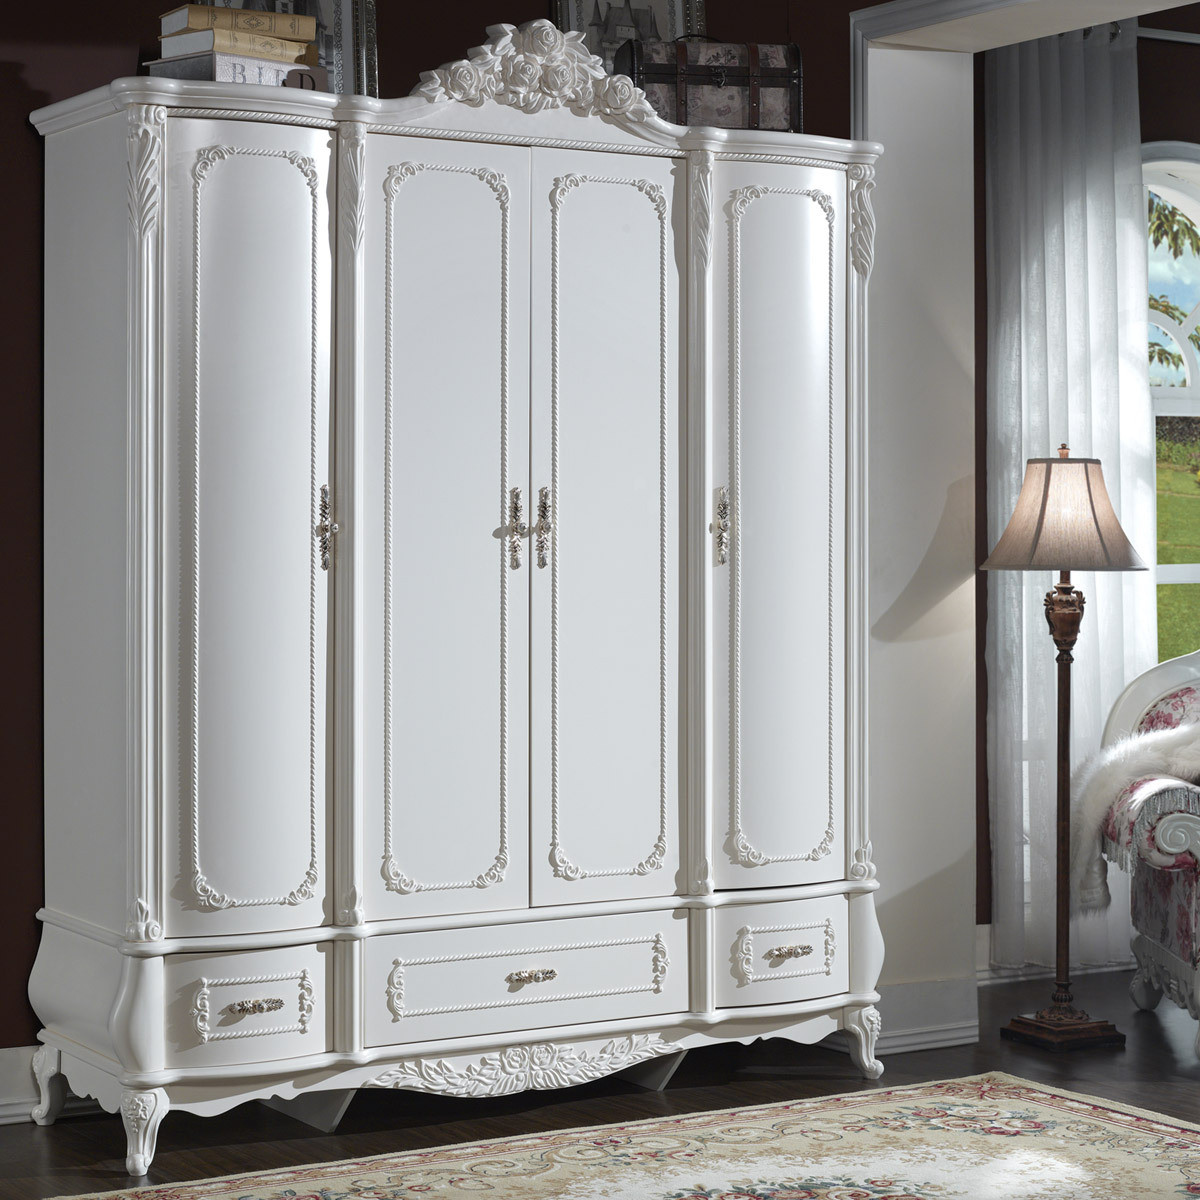 Wood Furniture Manufacturers White Wooden Wardrobe Designs